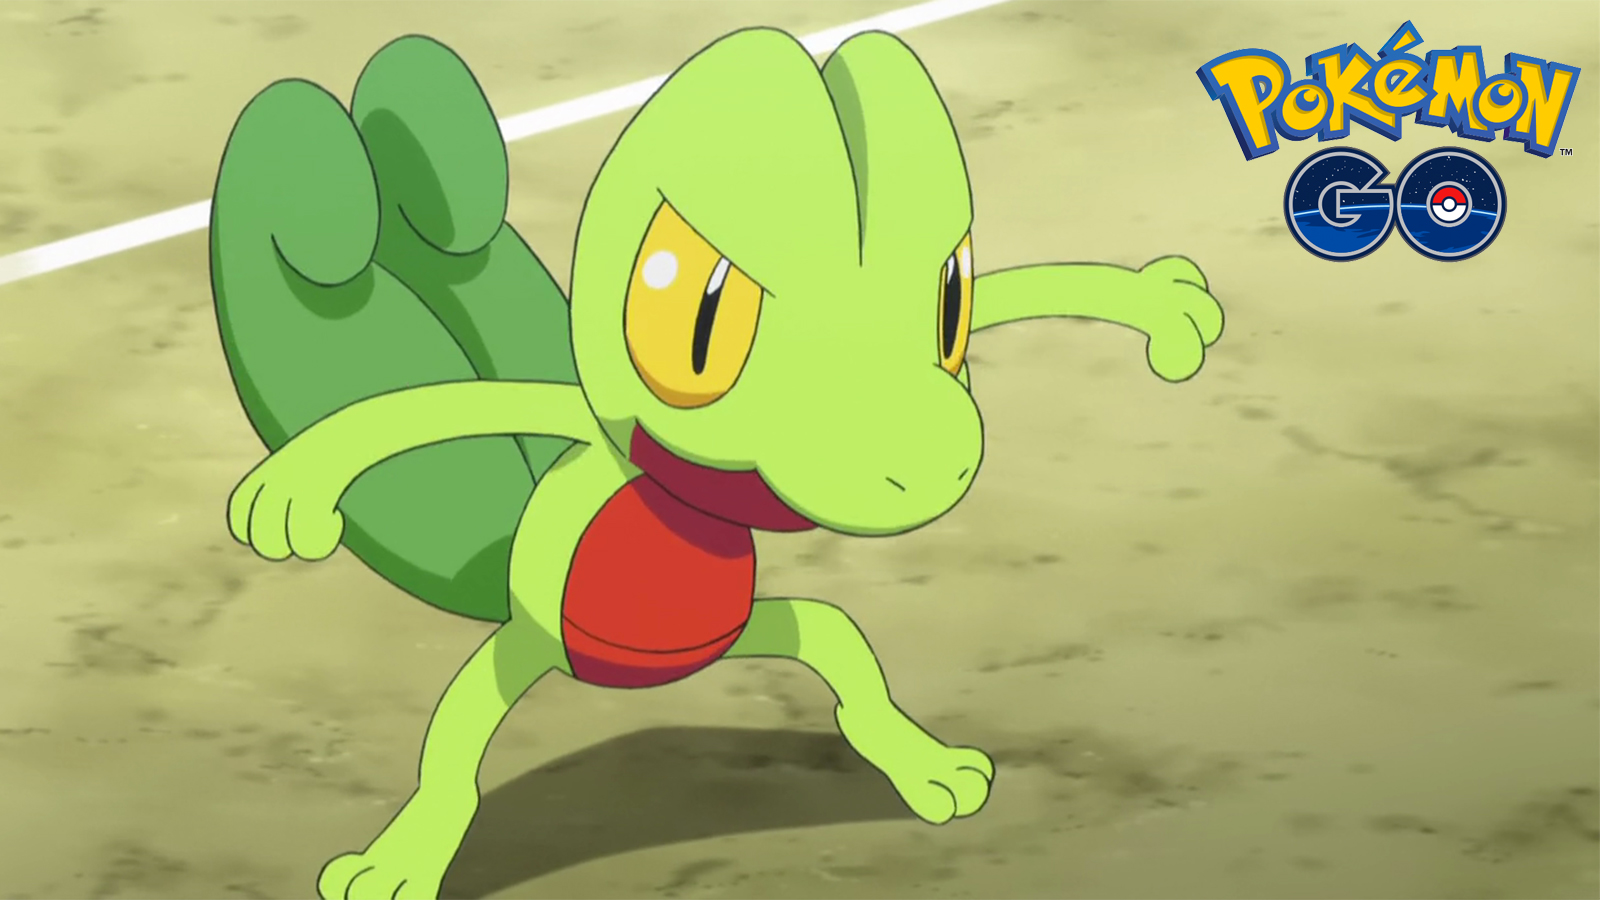 Pokemon Go Treecko